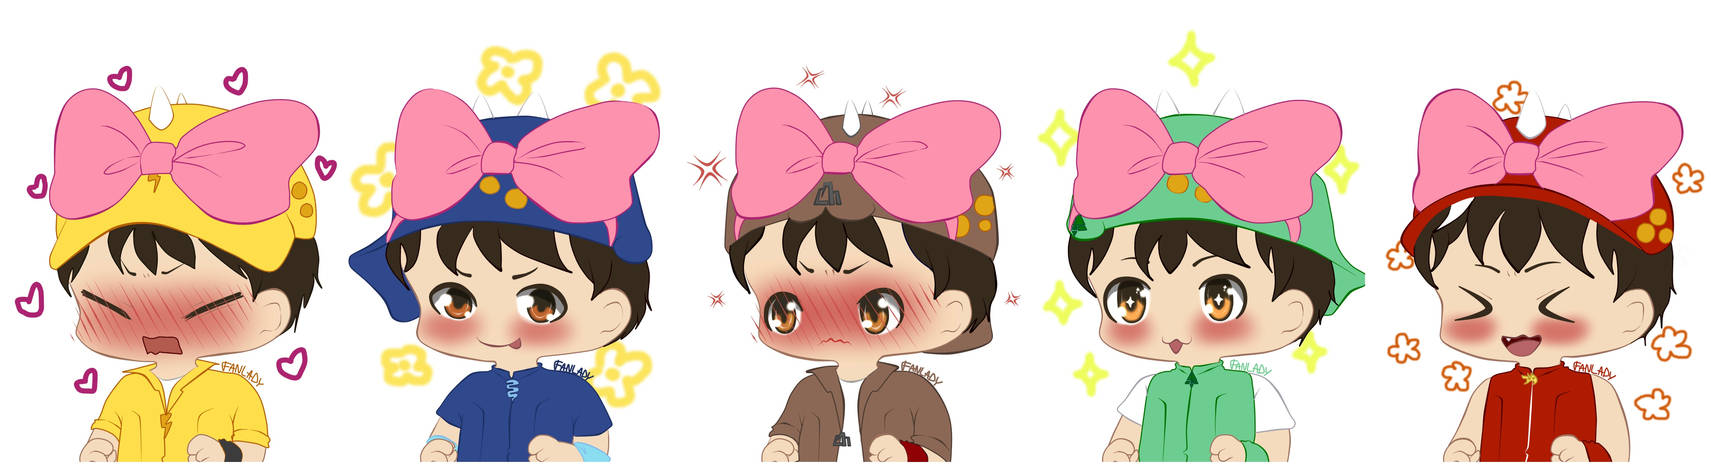 Pink-Ribbon Squad